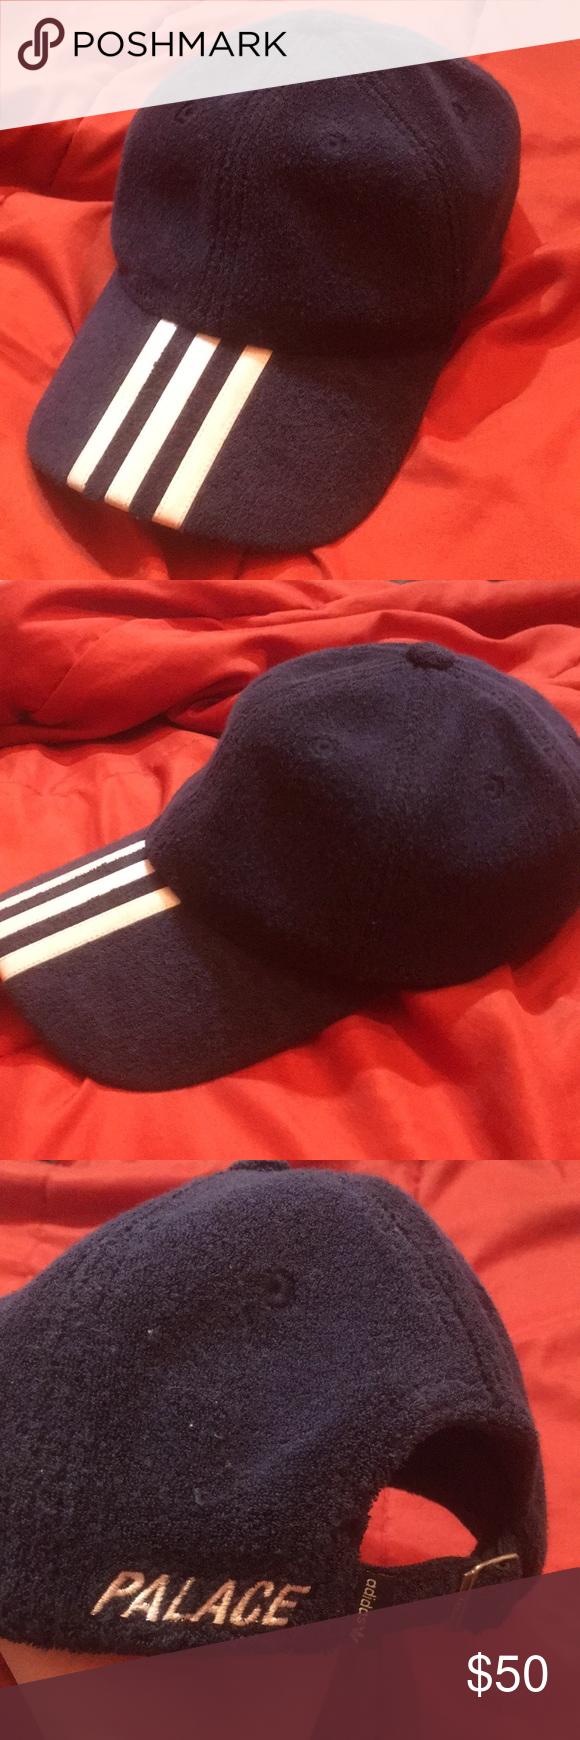 c21905a1331e8 Palace x Adidas Towel Hat